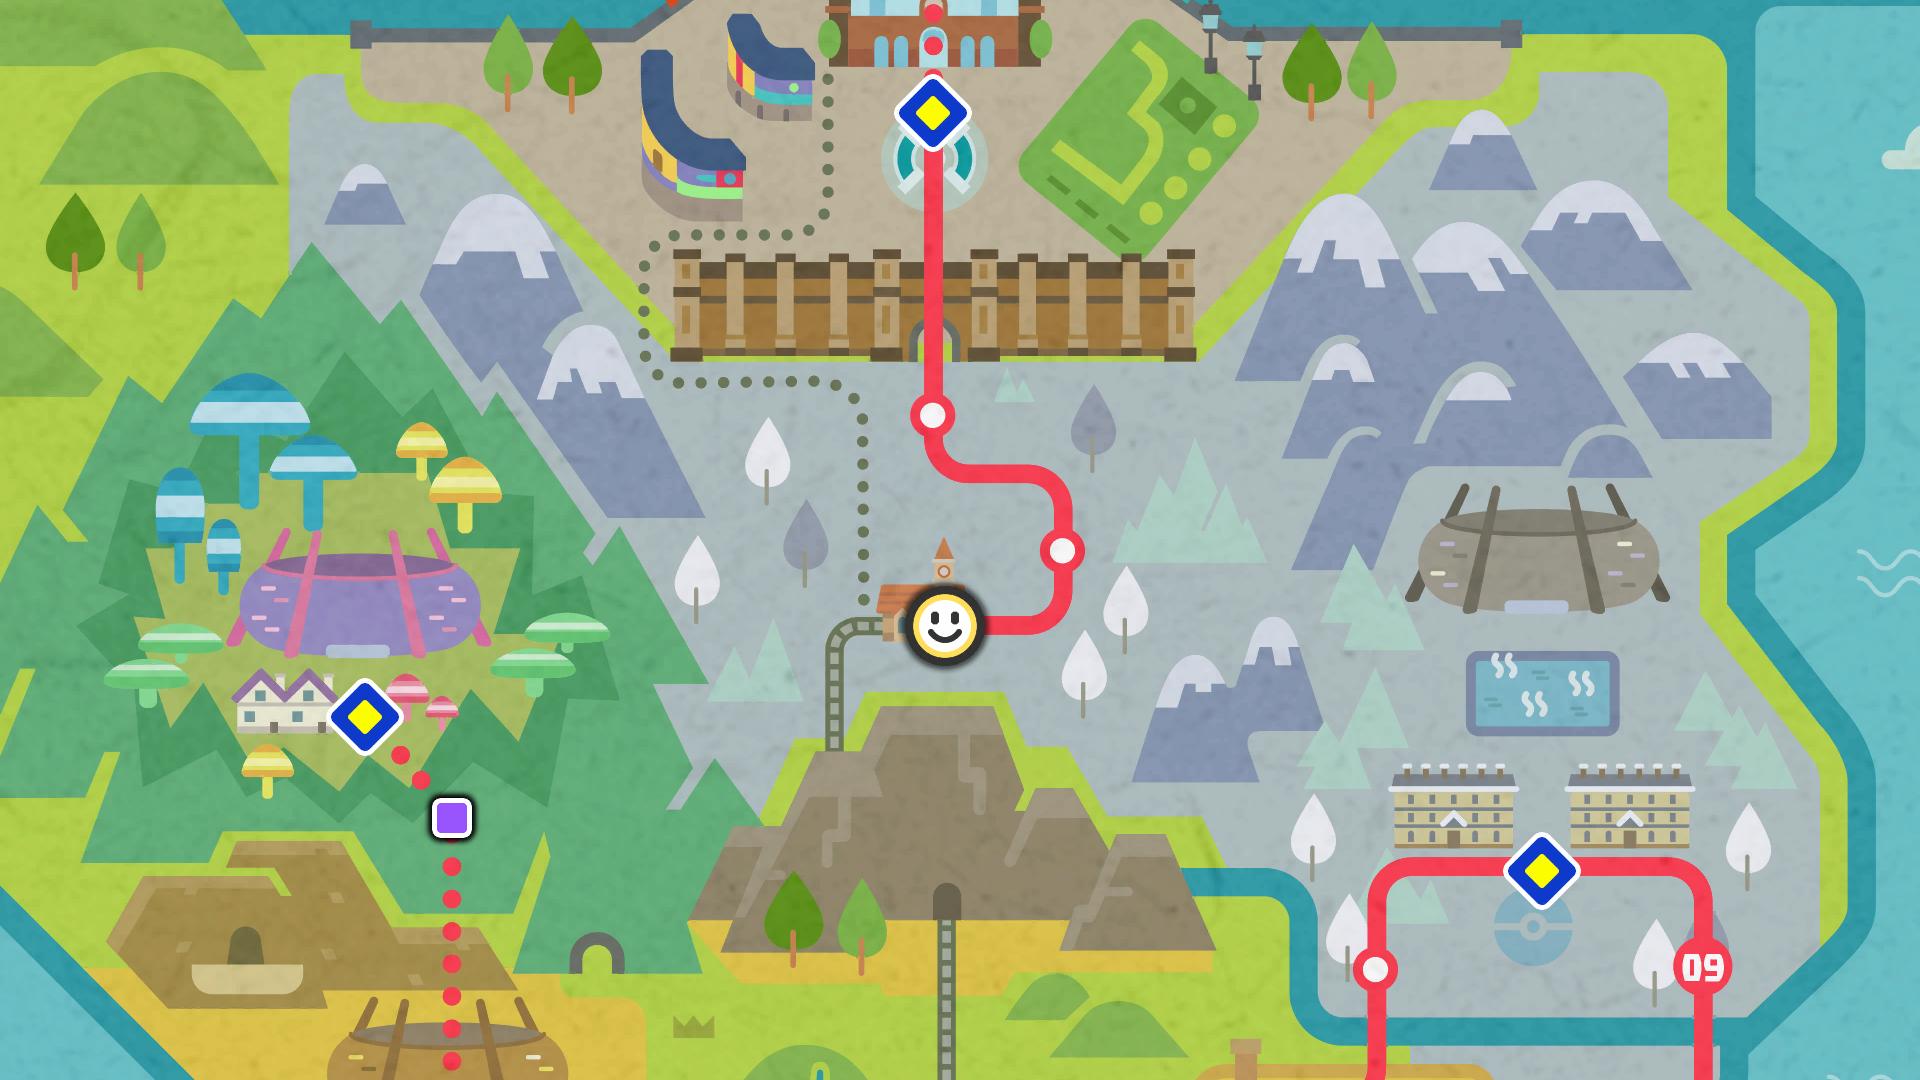 Percorso 10 Galar SpSc mappa.png